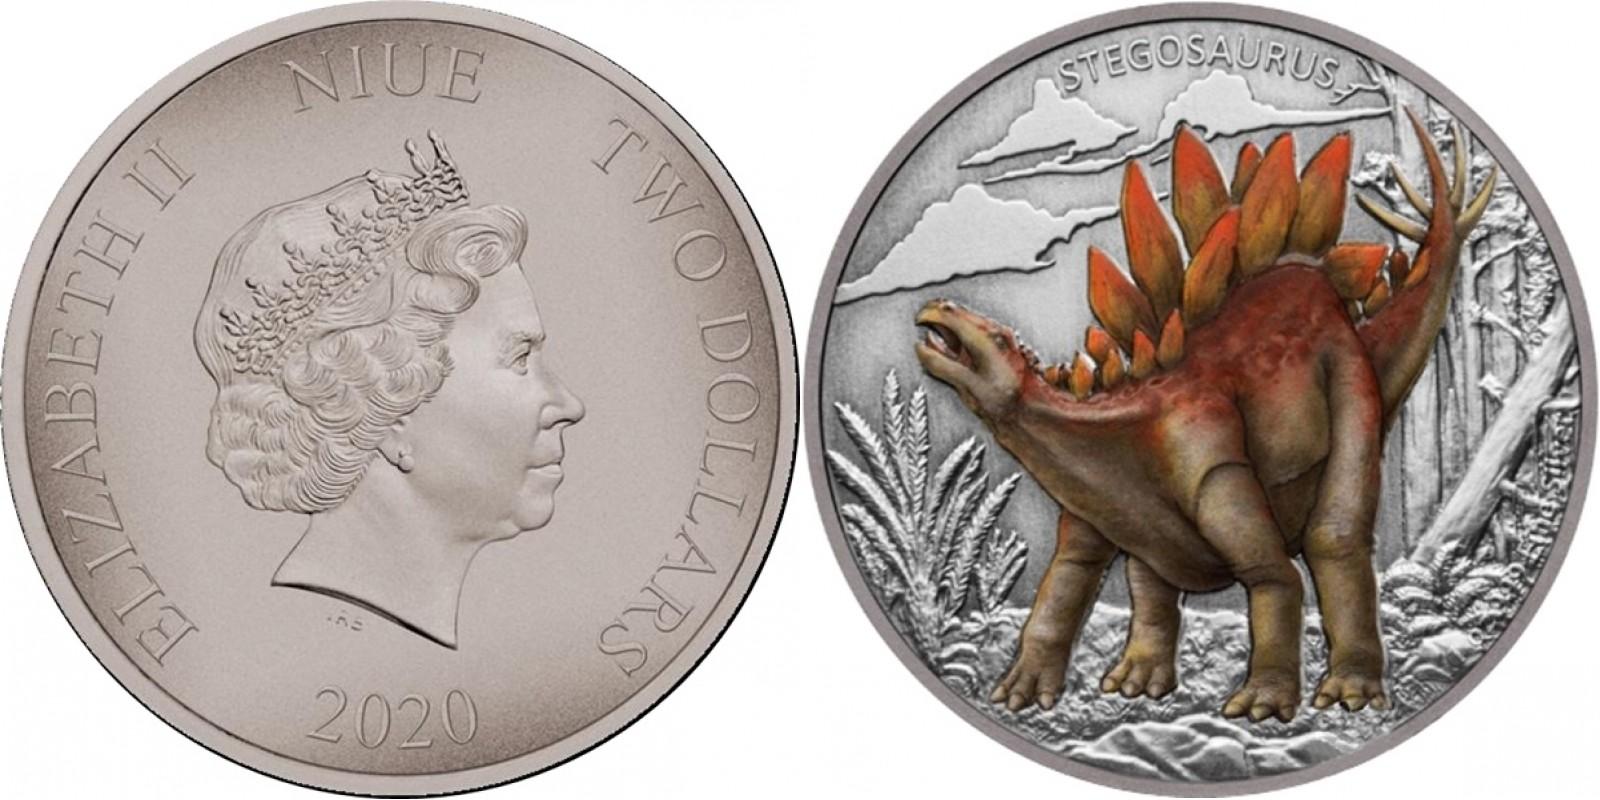 niue-2020-dinosaures-stegosaure